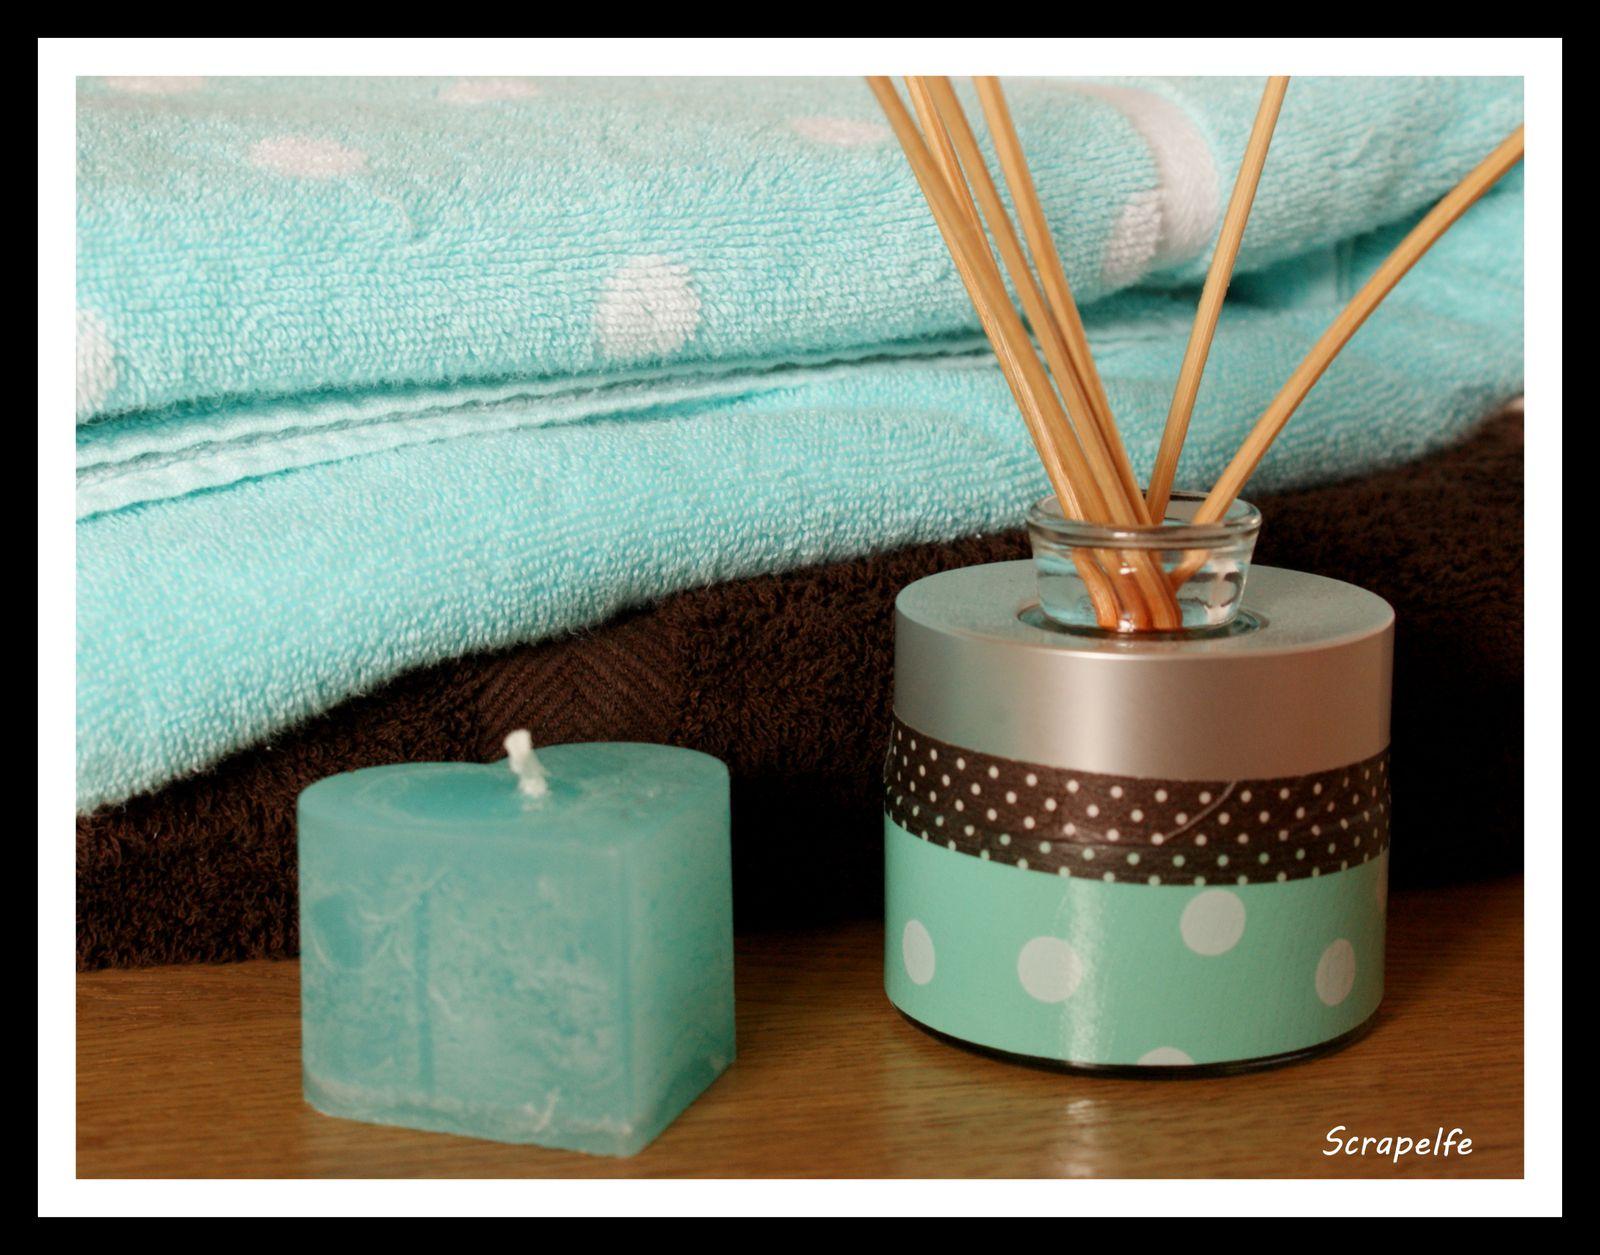 nouvelles couleurs les petits blabla de scrapelfe. Black Bedroom Furniture Sets. Home Design Ideas